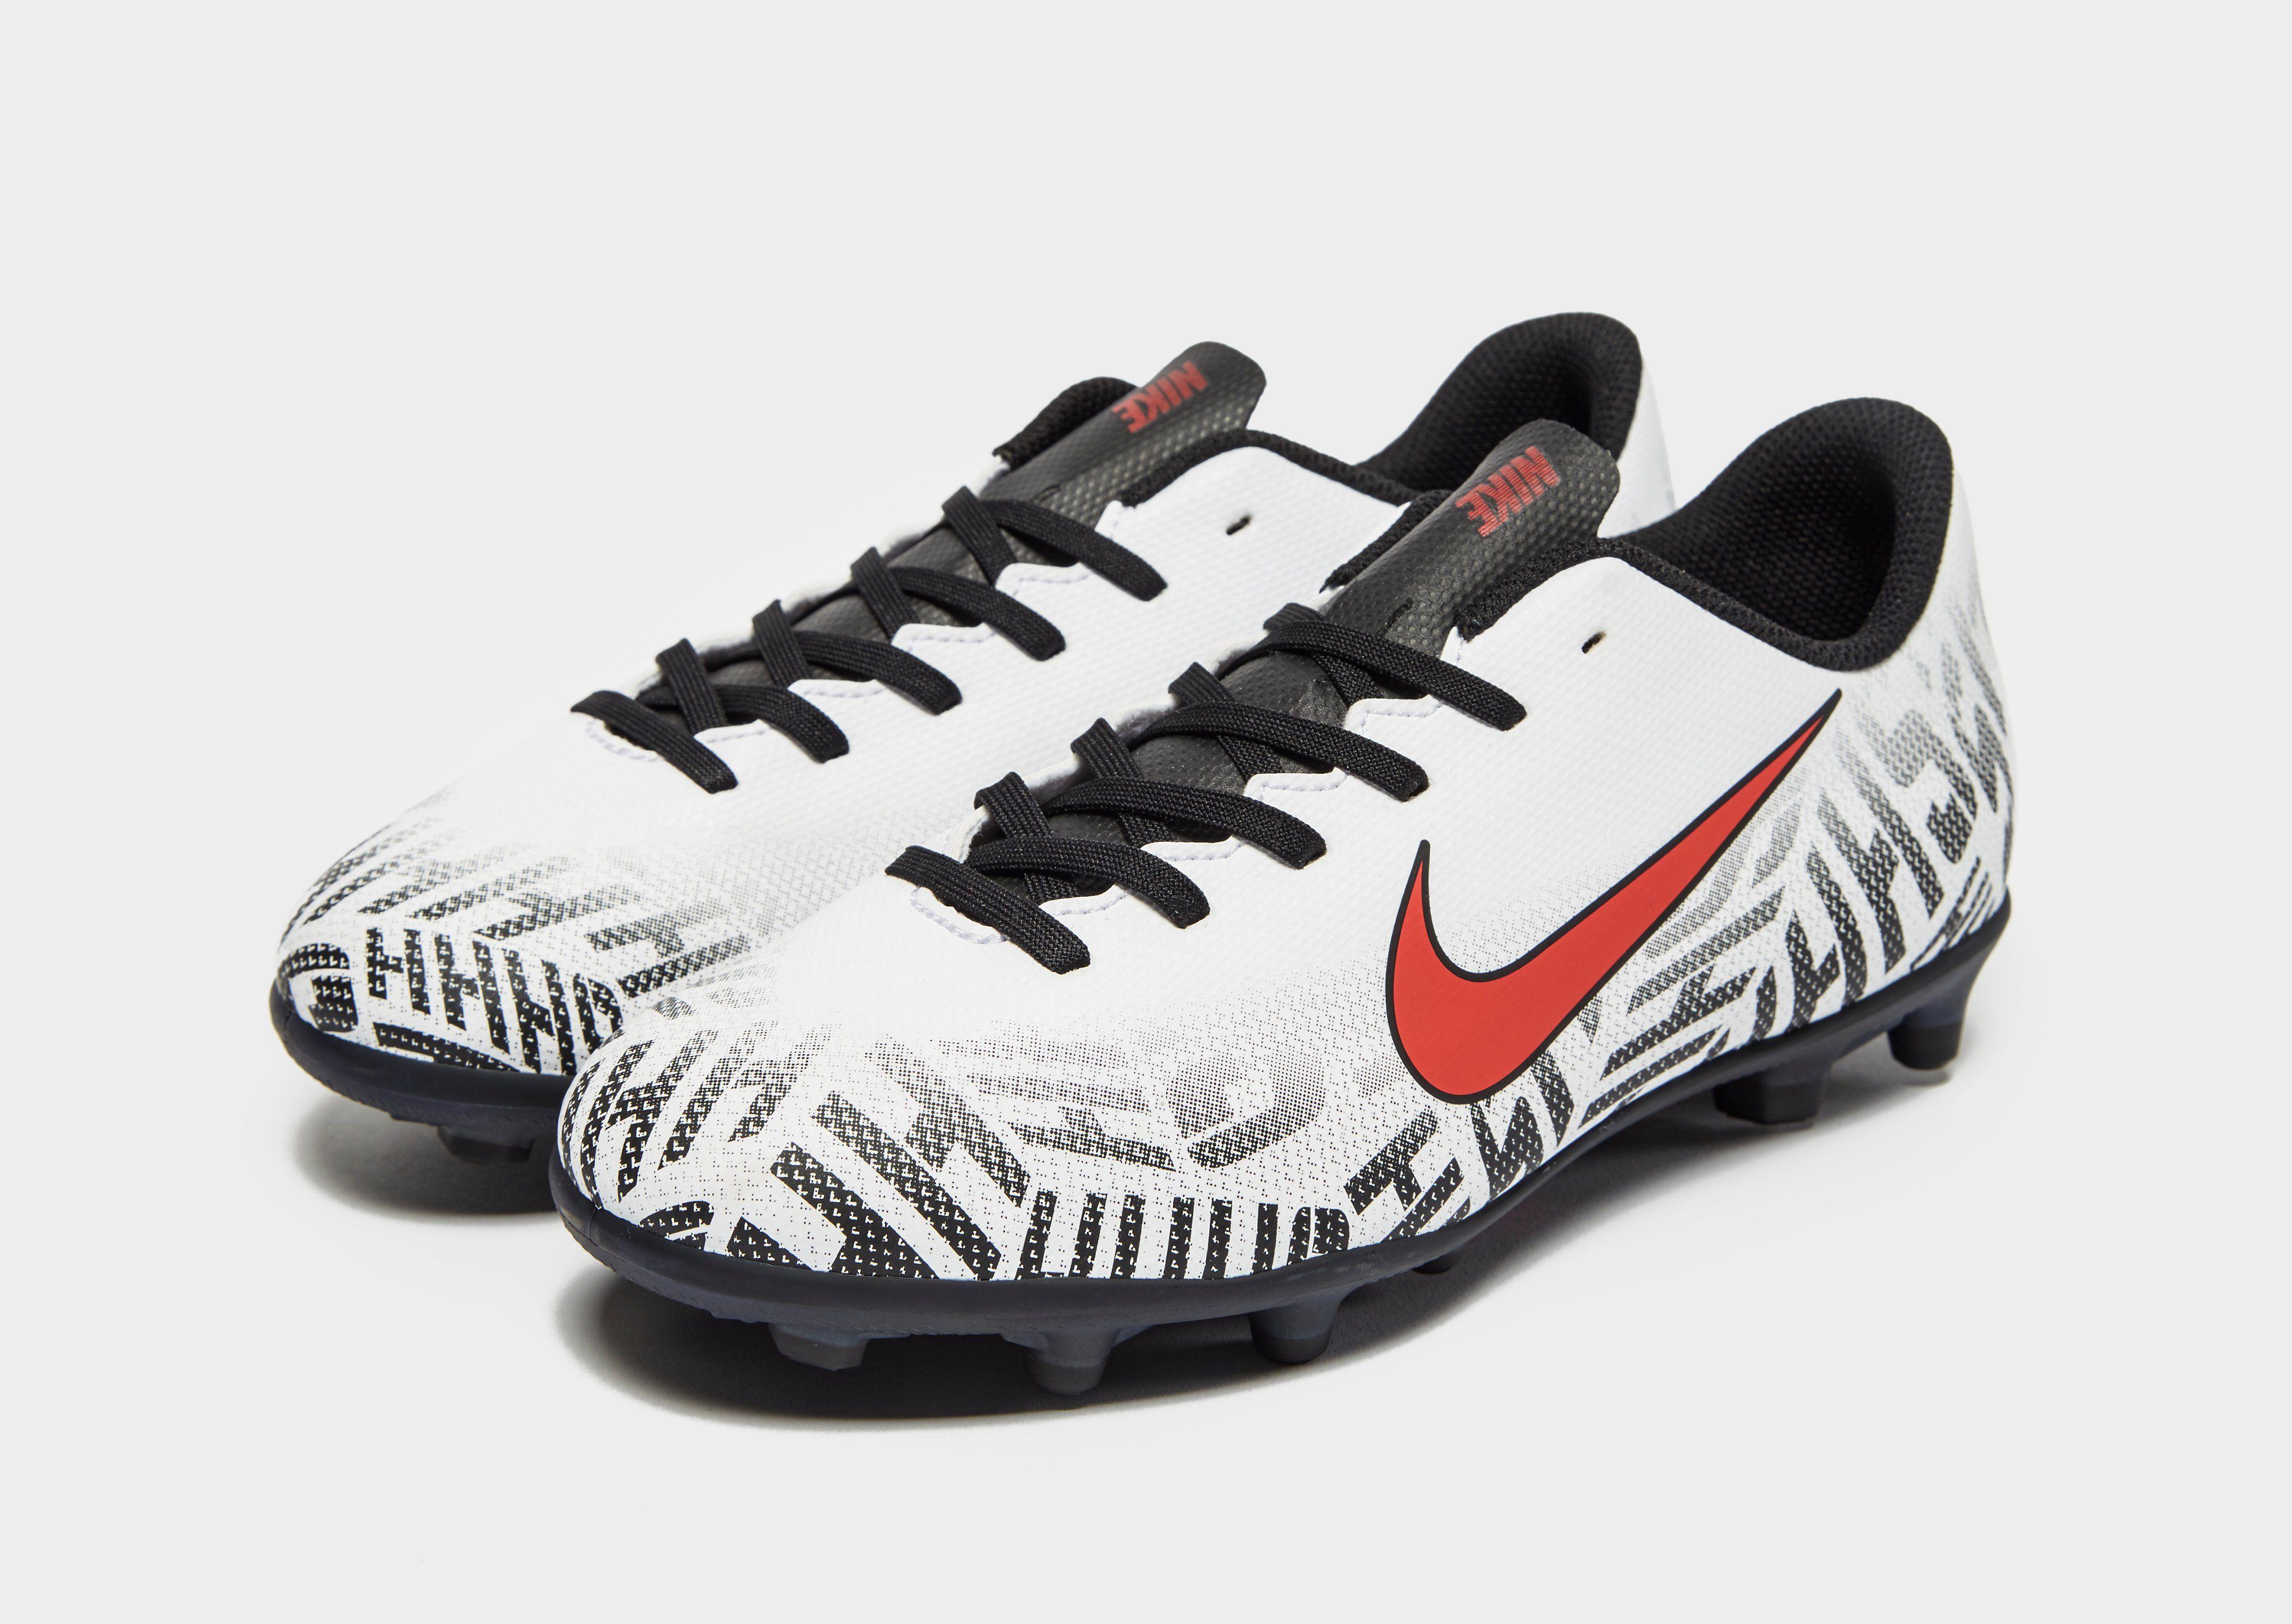 Nike Silencio Mercurial Vapor Club Neymar Jr FG Junior